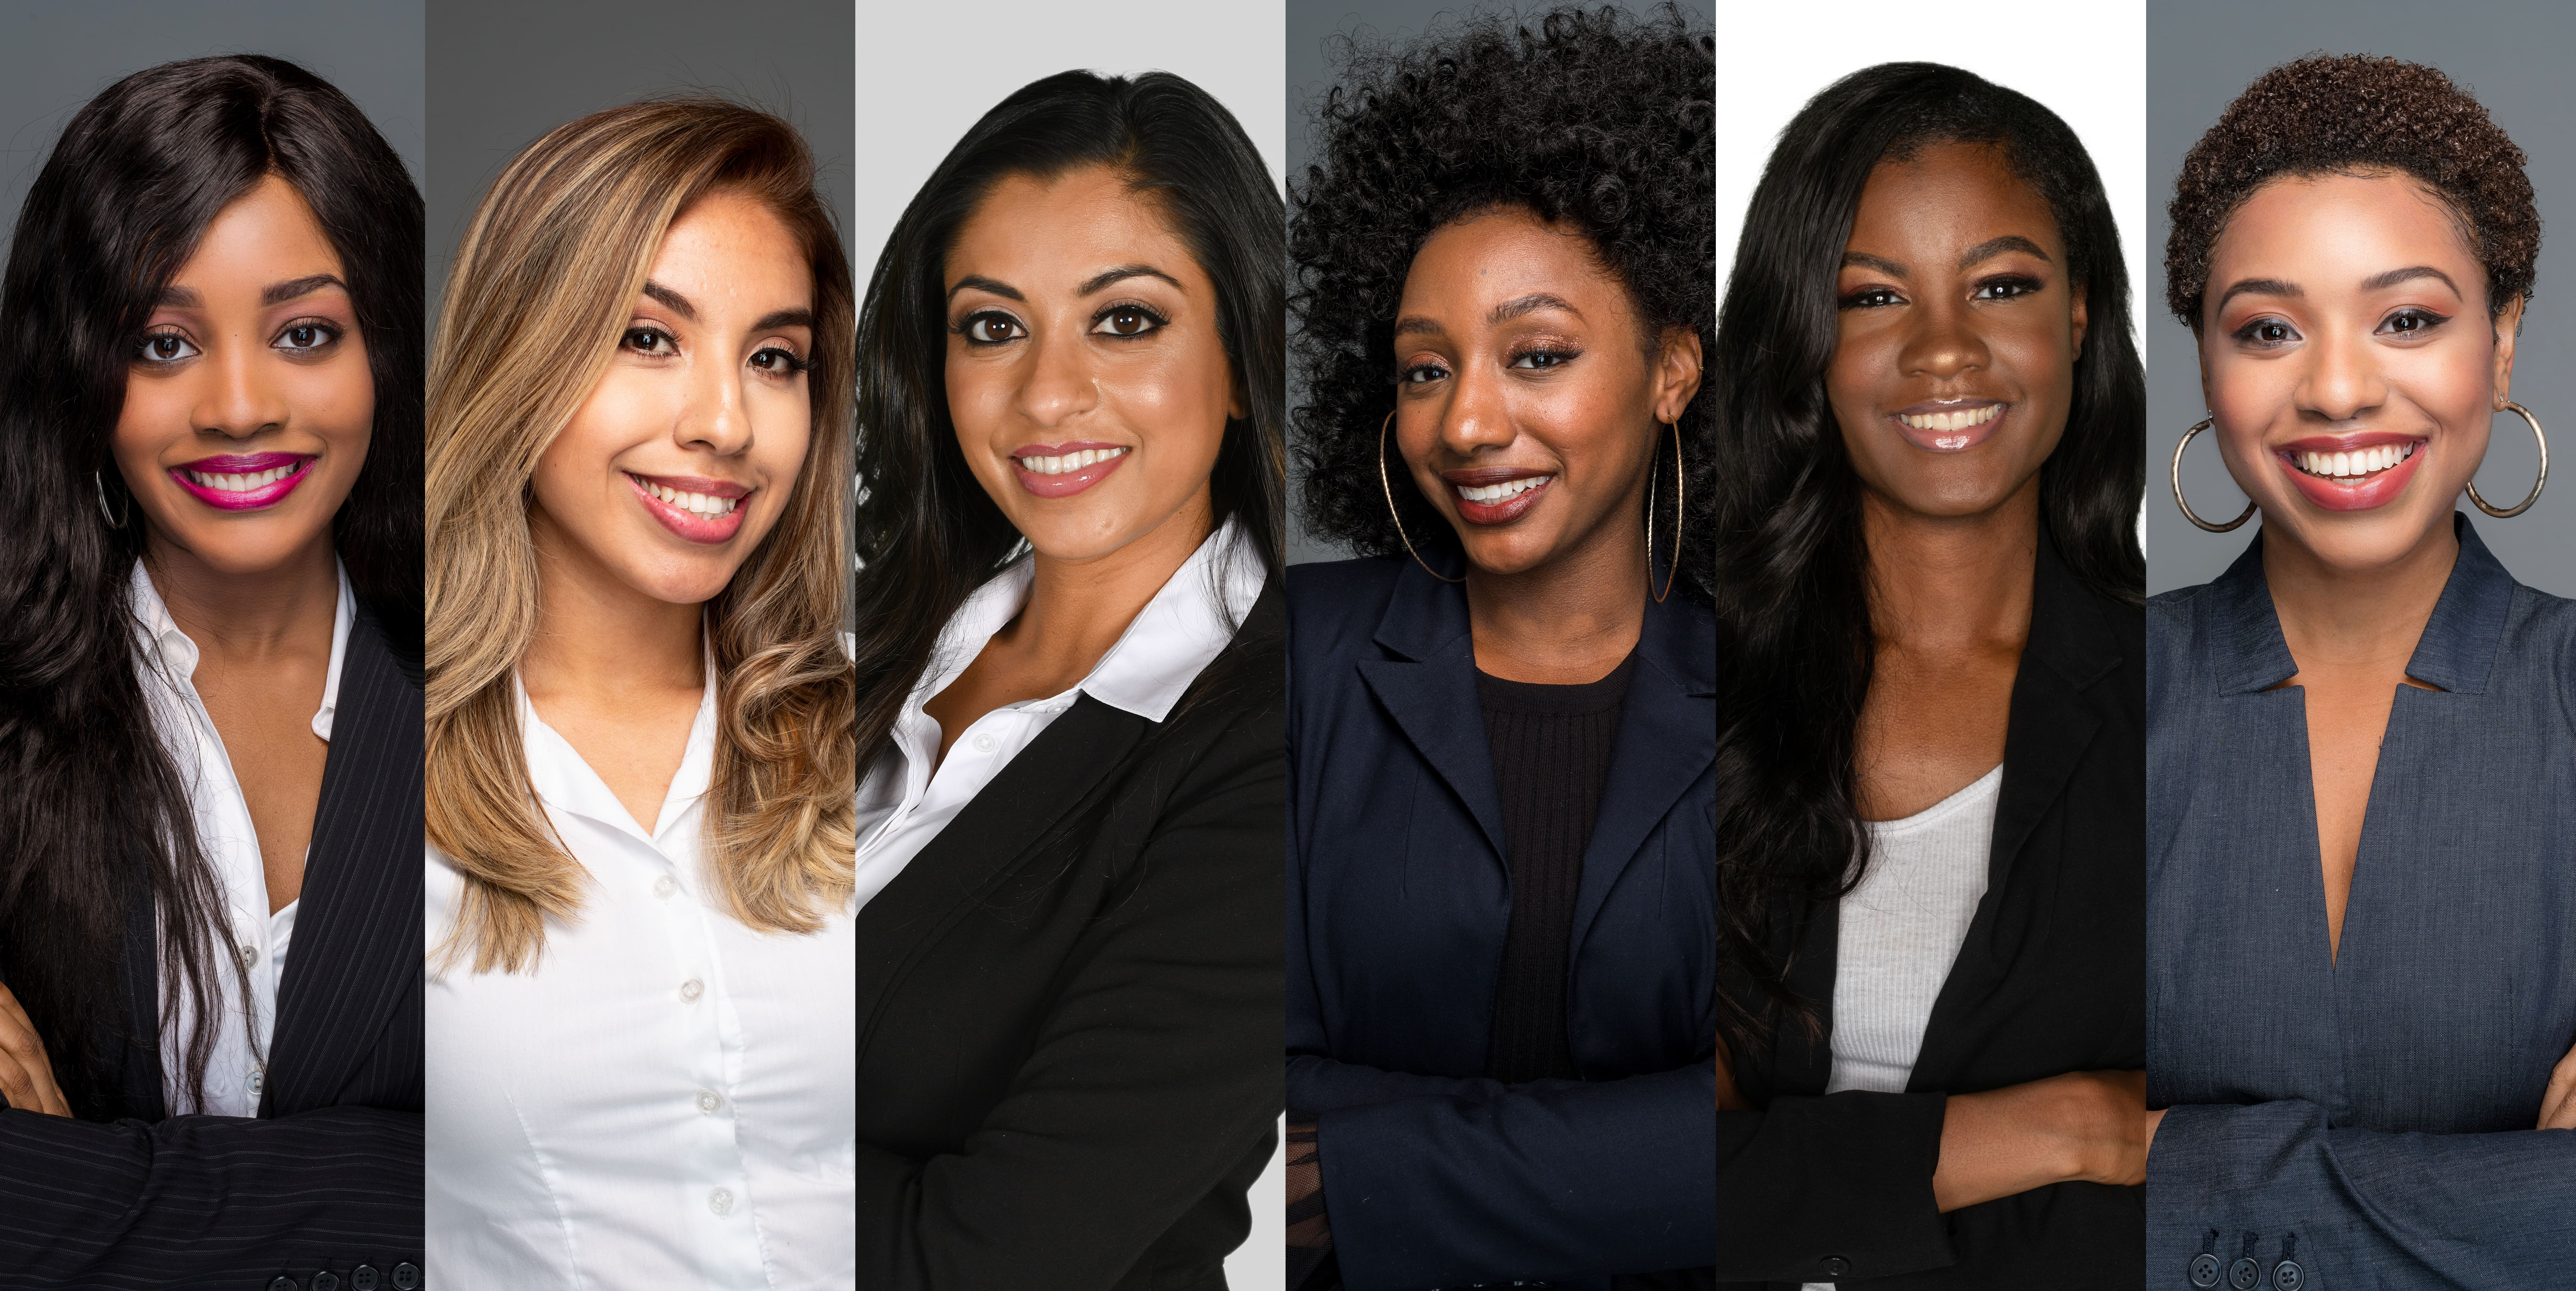 Mulheres na liderança